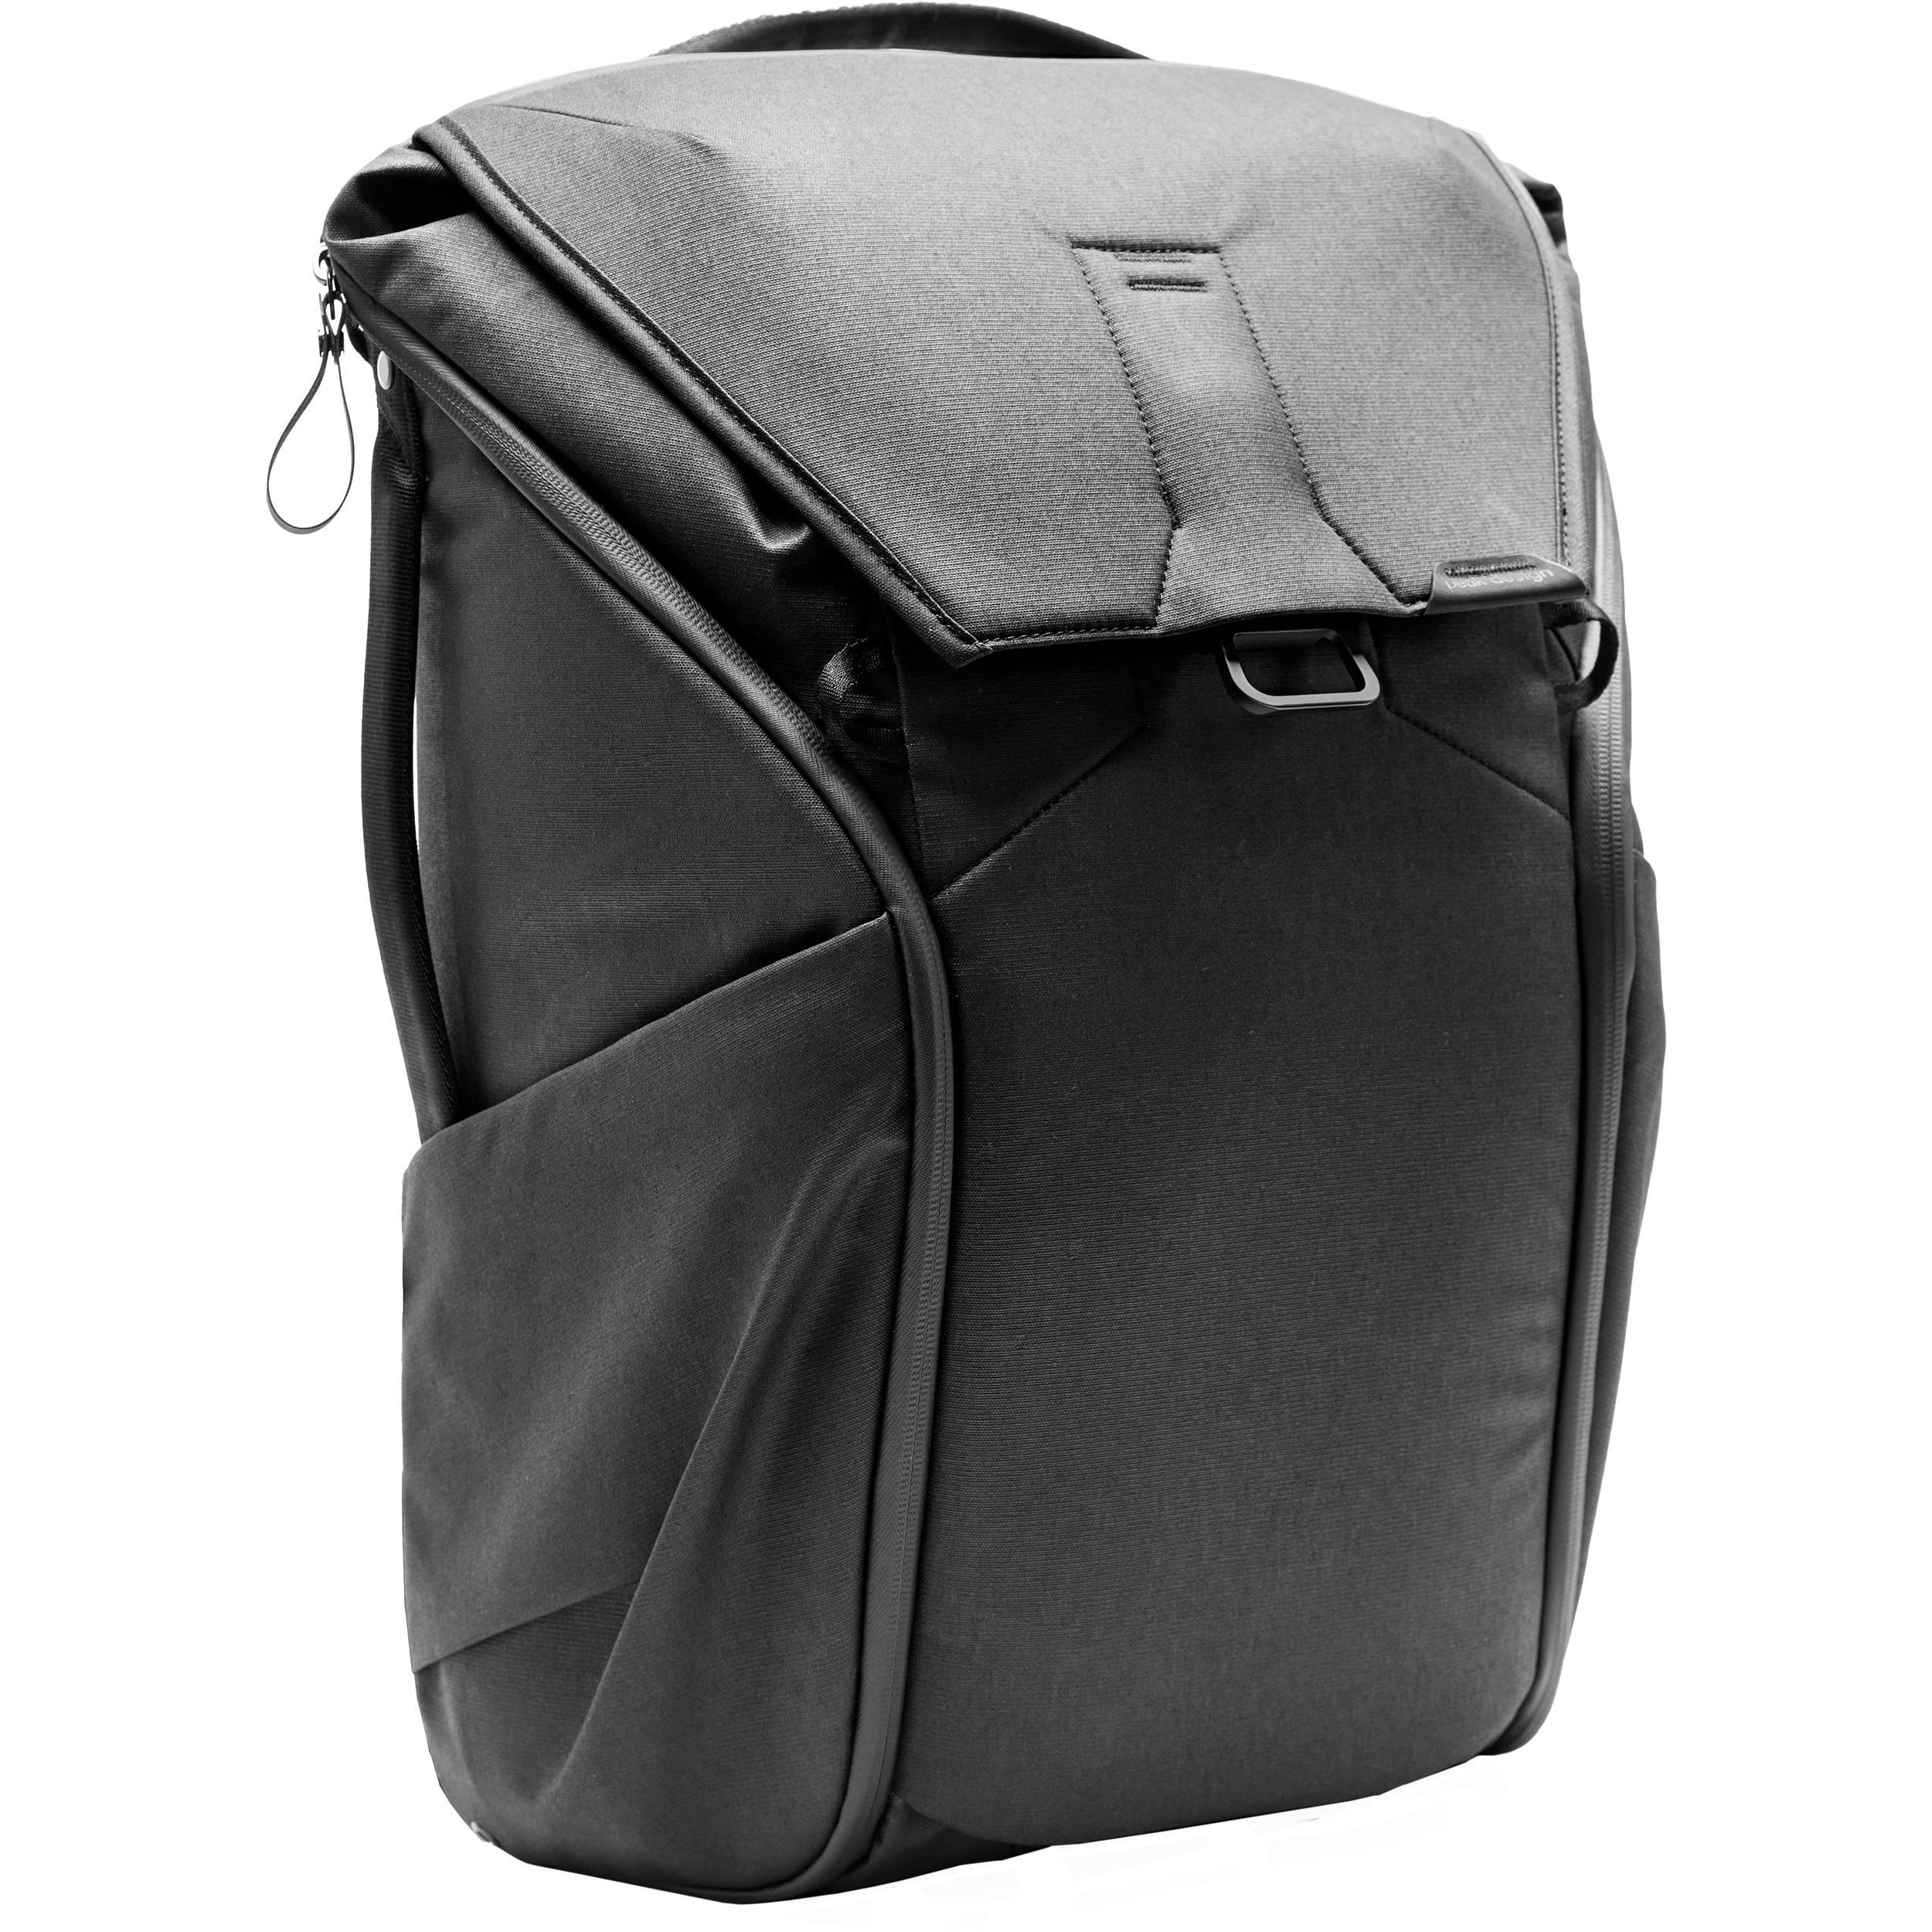 1d98e30739e0 Used Peak Design Everyday Backpack (30L